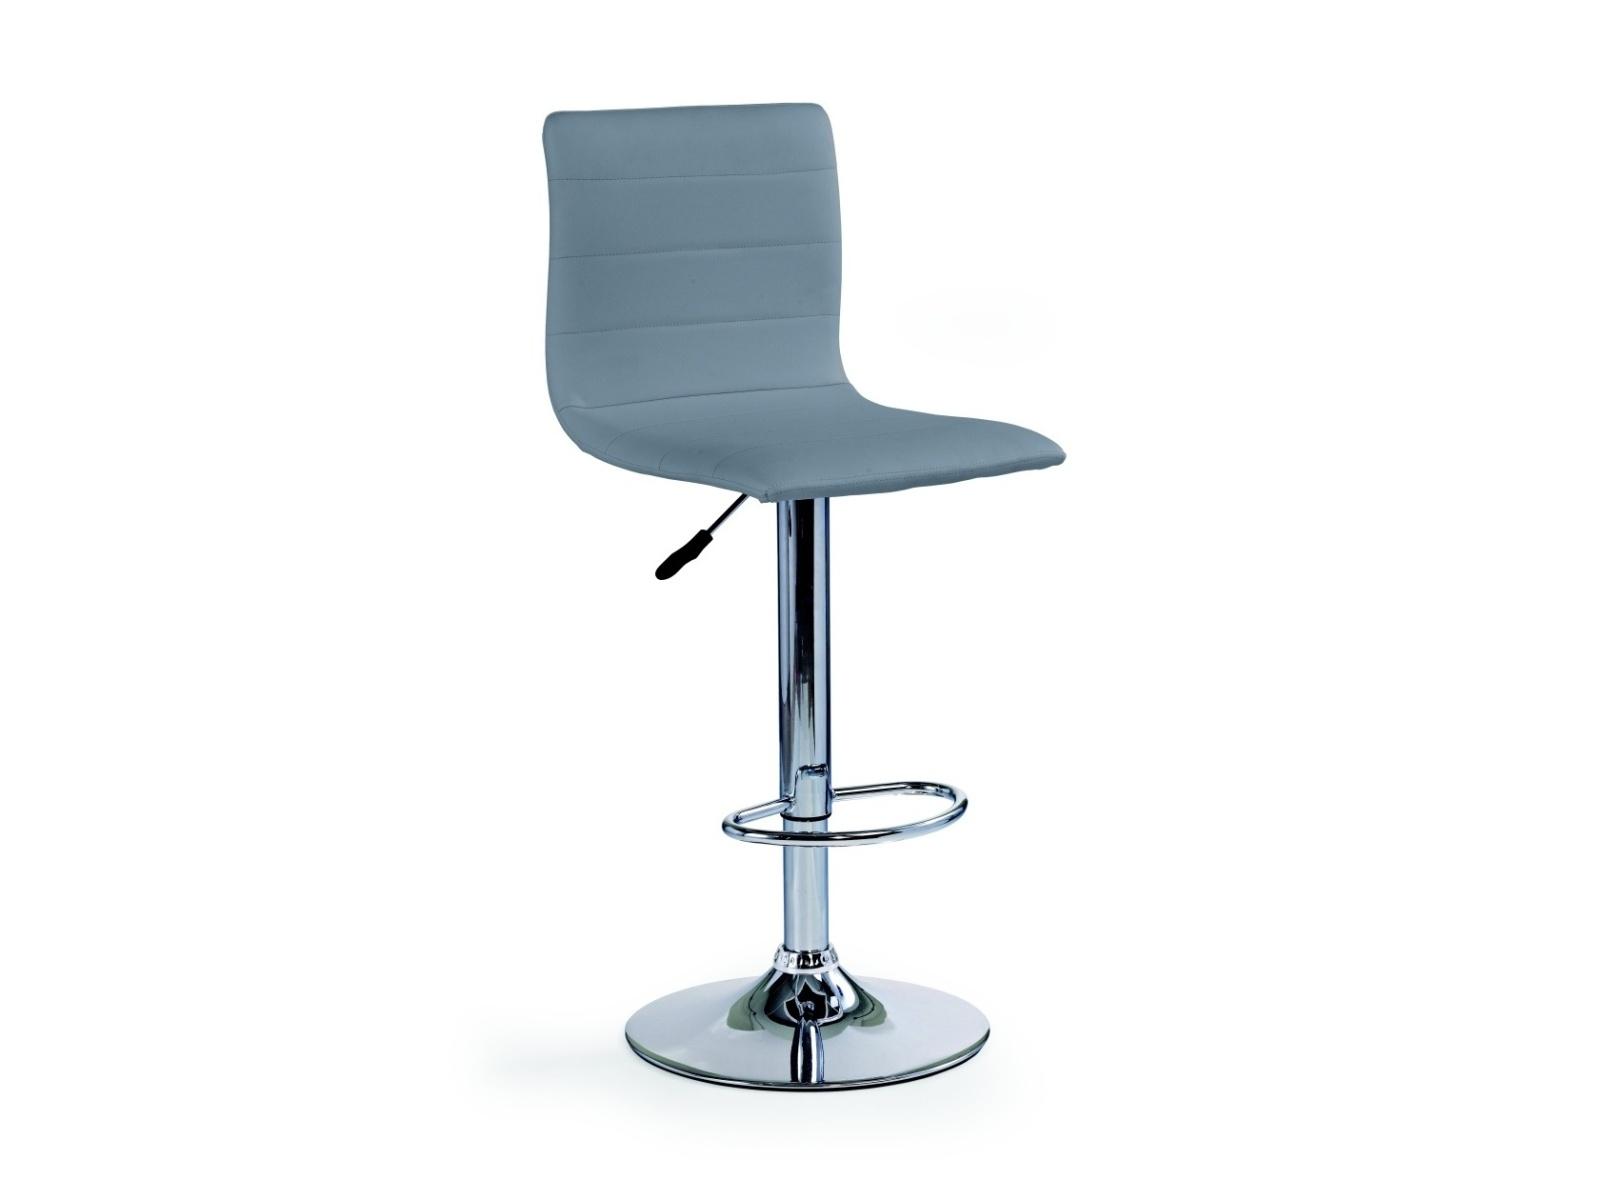 Smartshop Barová židle H-21, šedá